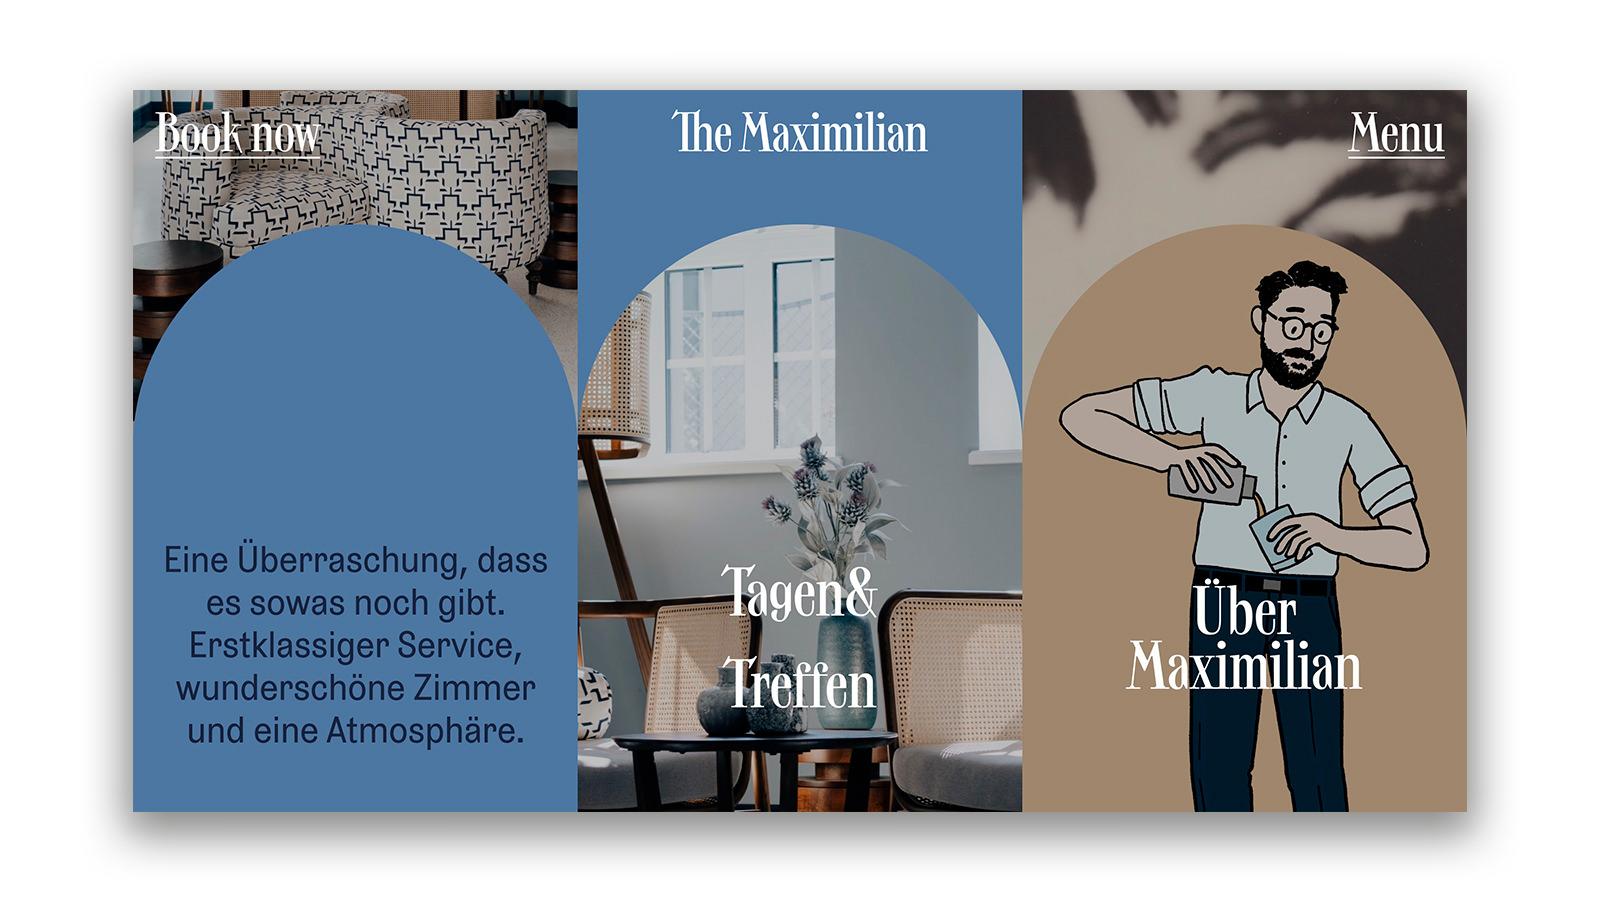 The Maximilian 21